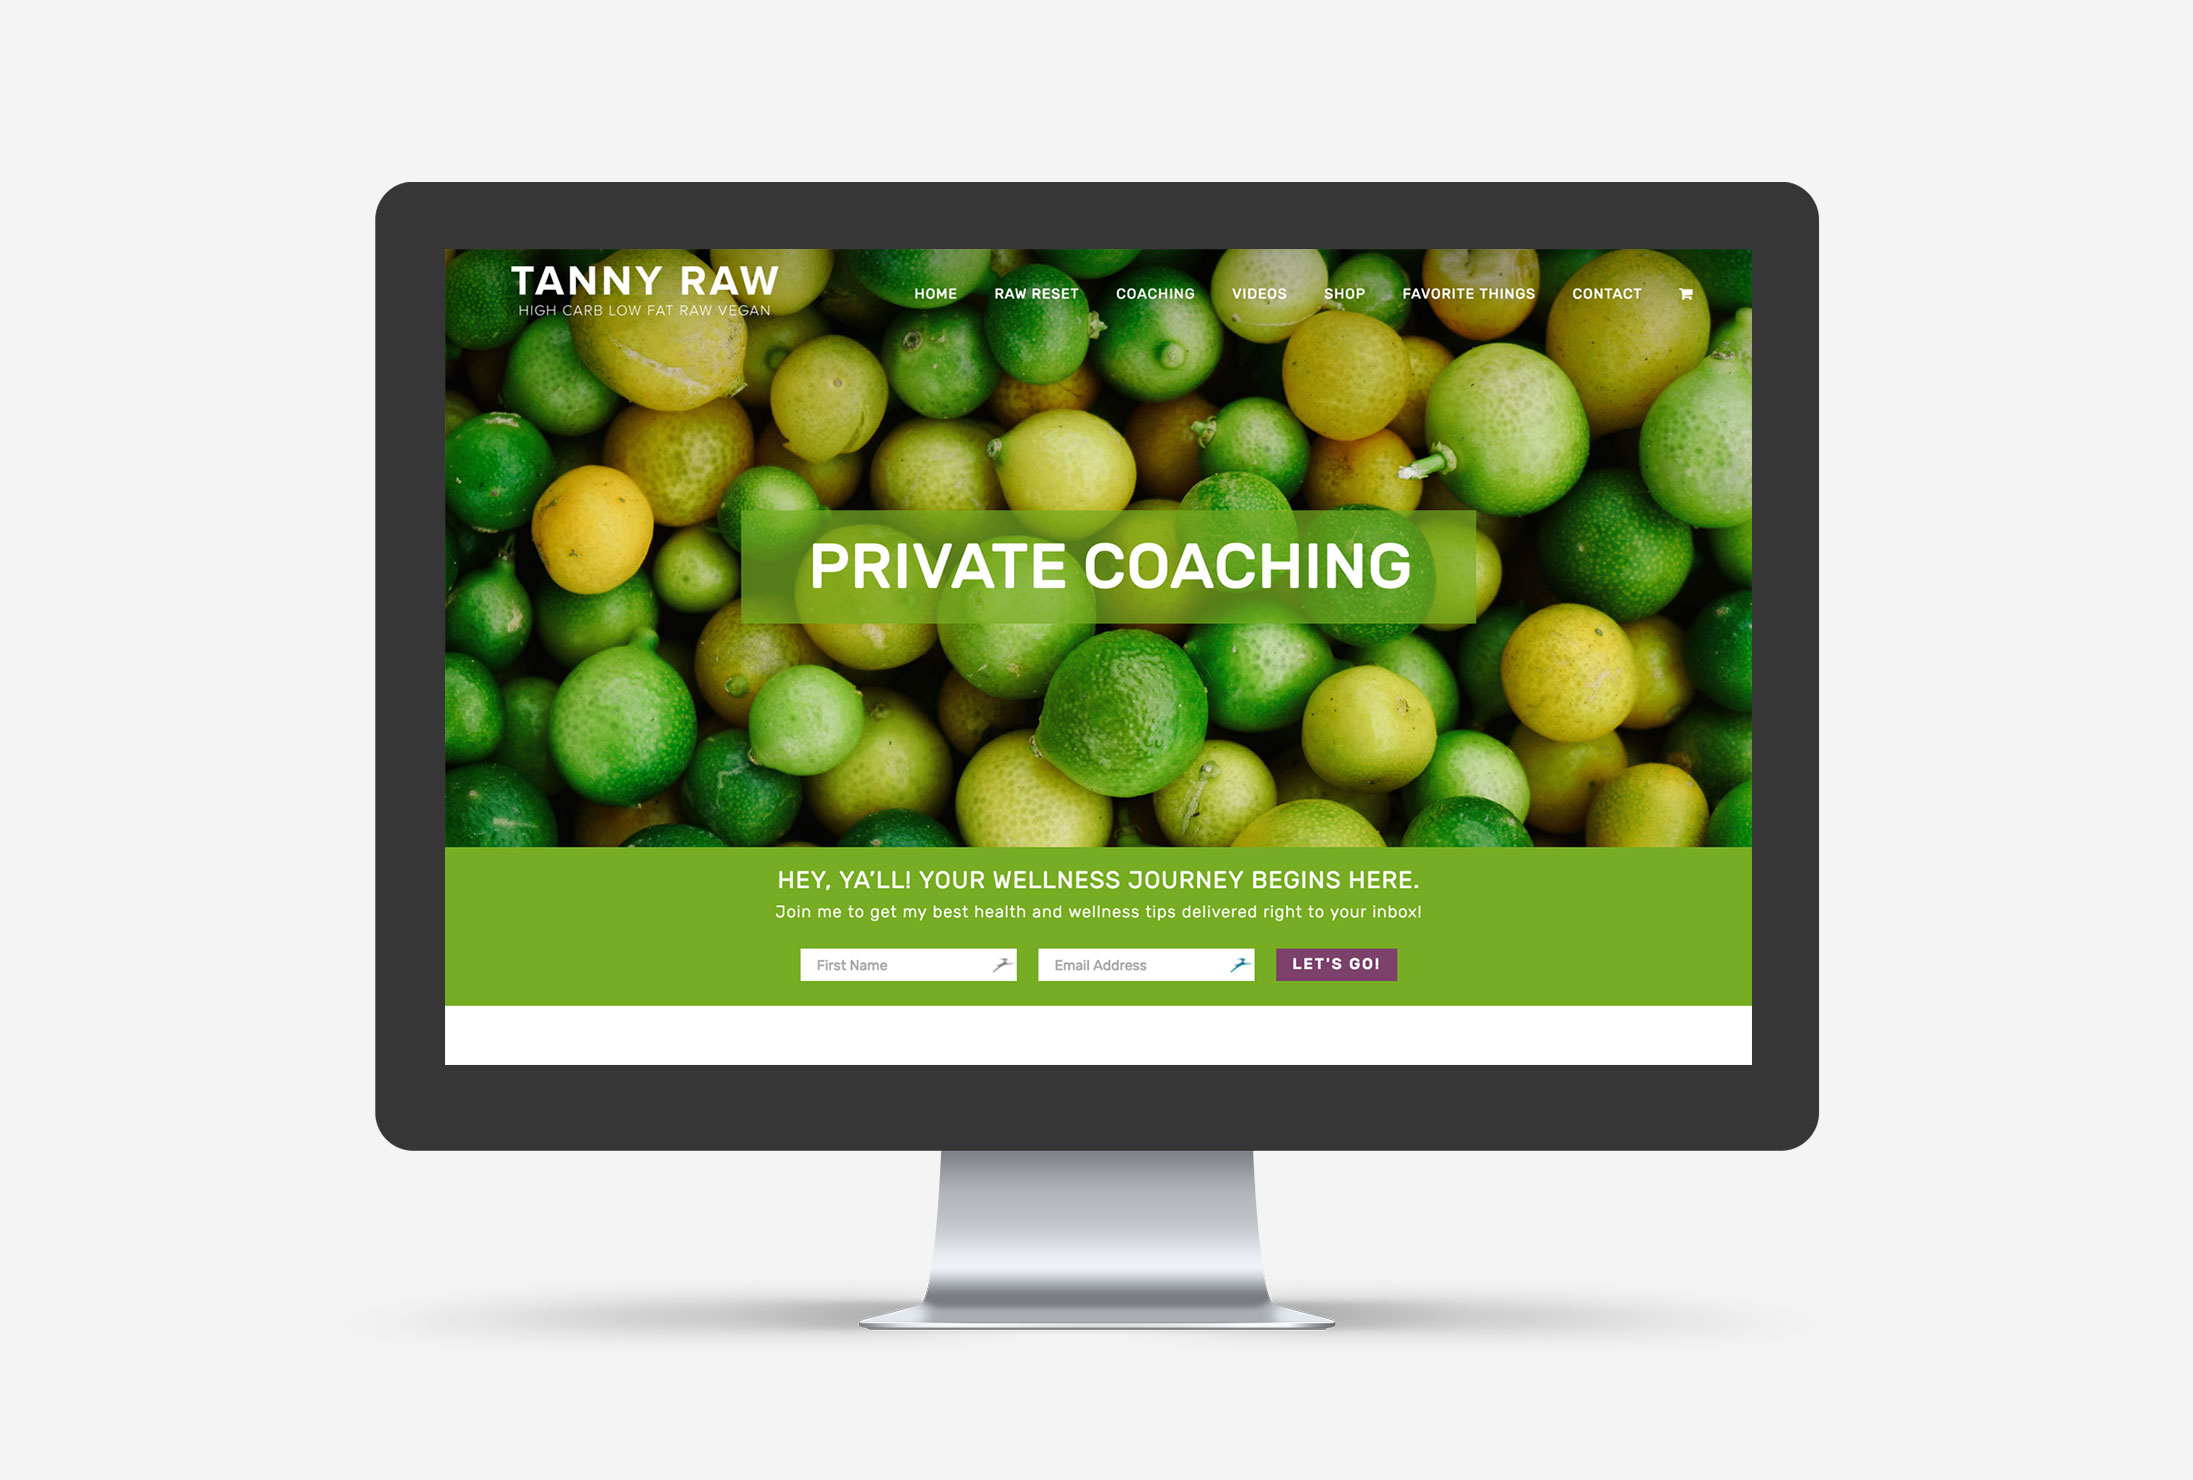 Tanny Raw Small Business WordPress Web Design